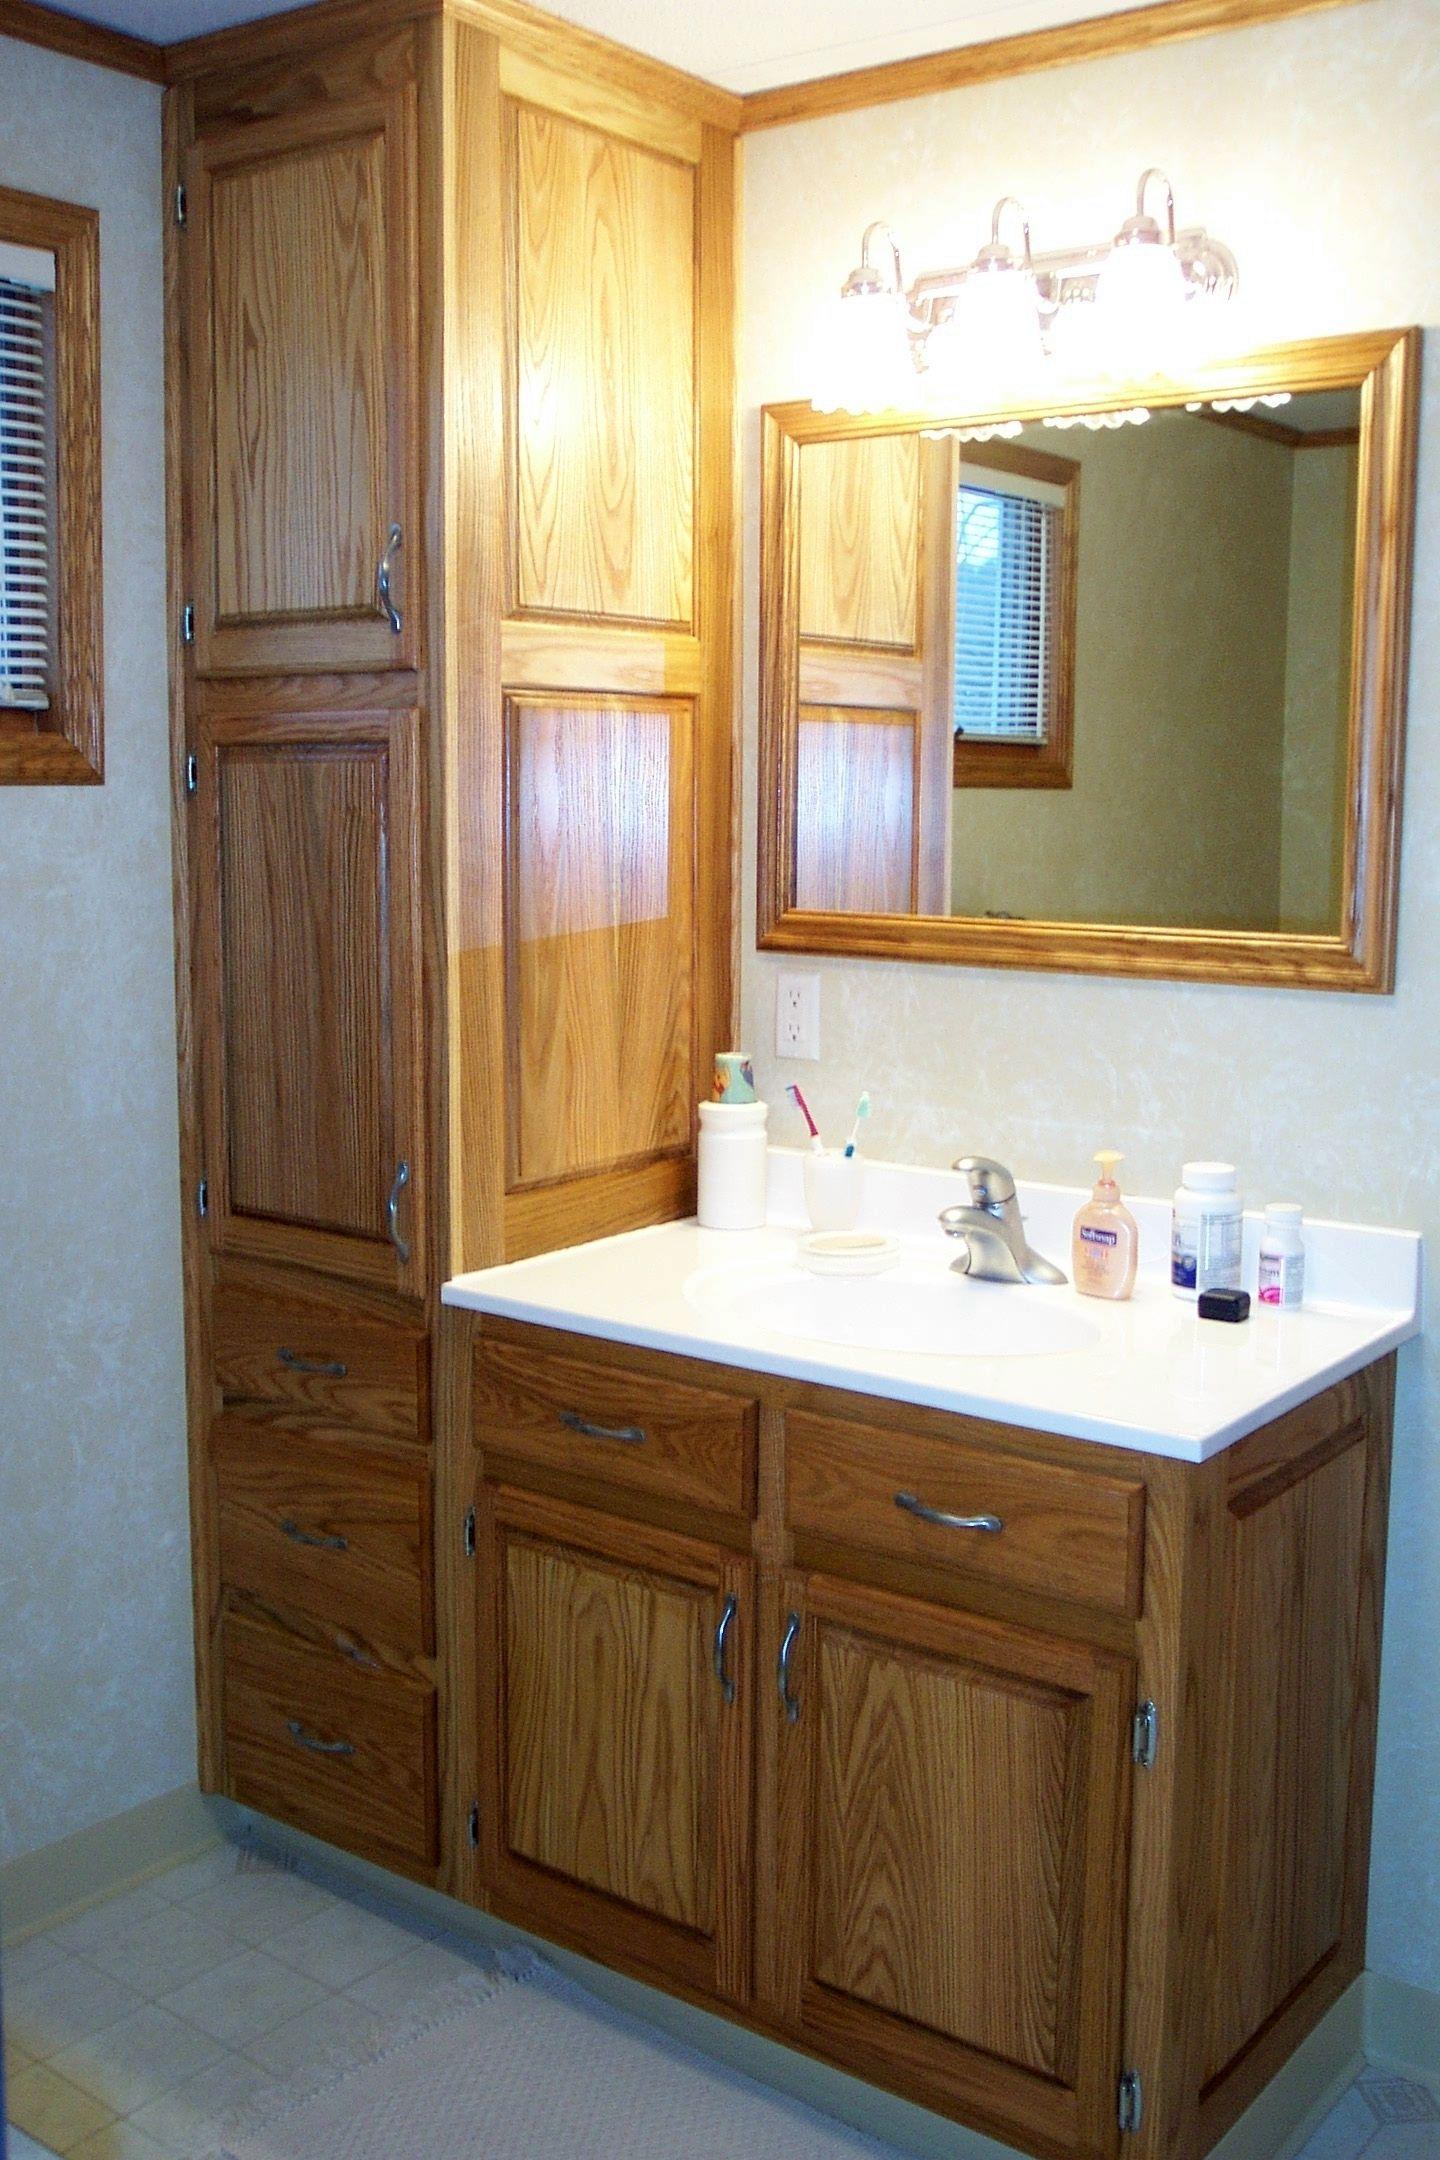 Floor To Ceiling Cabinet For Bathroom | Small bathroom ...